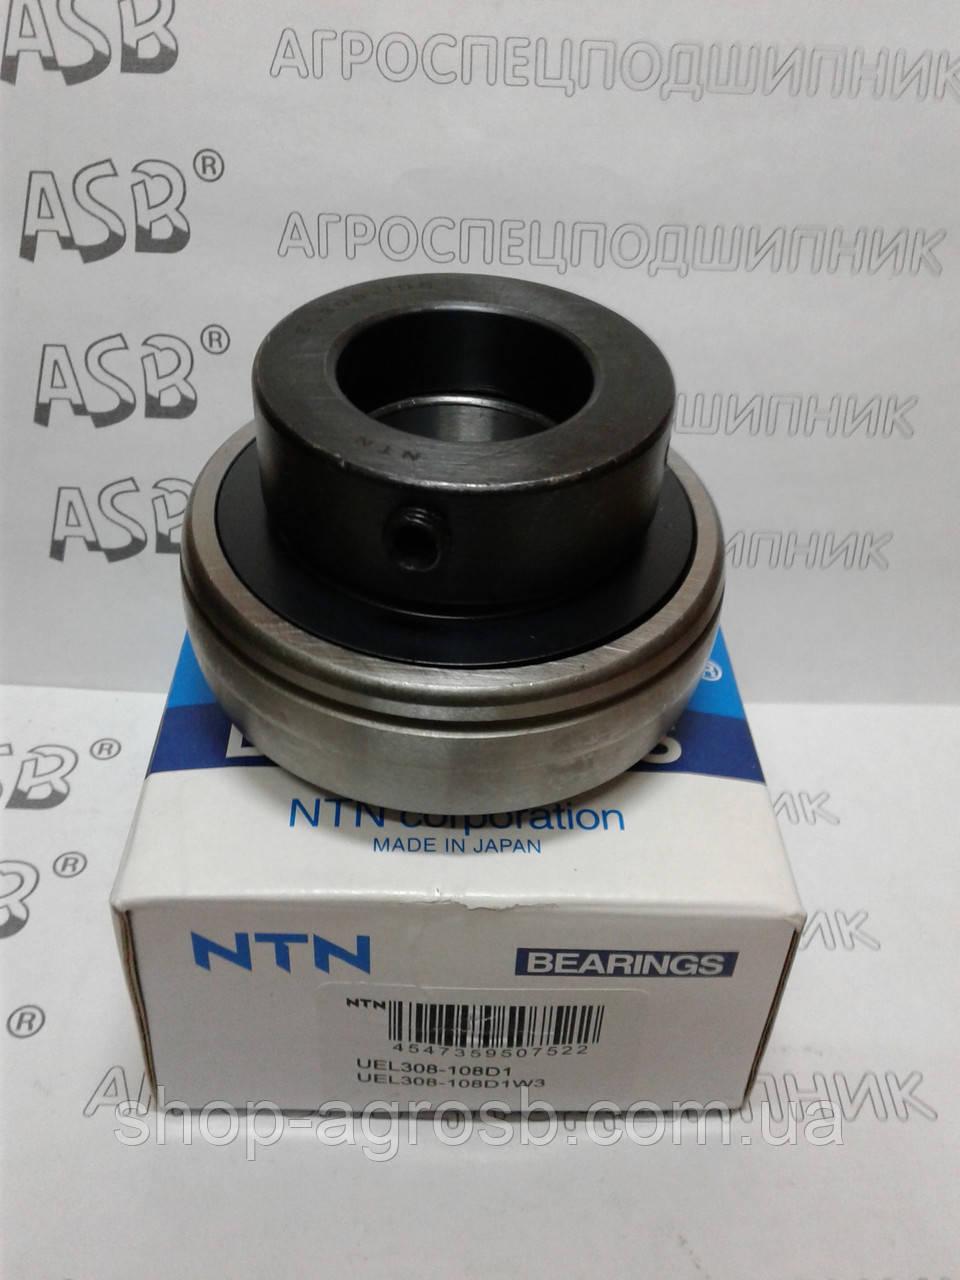 Подшипник NTN UEL308-108D1W3, GN108KRRB, GN108KLLB, EX308-24G2